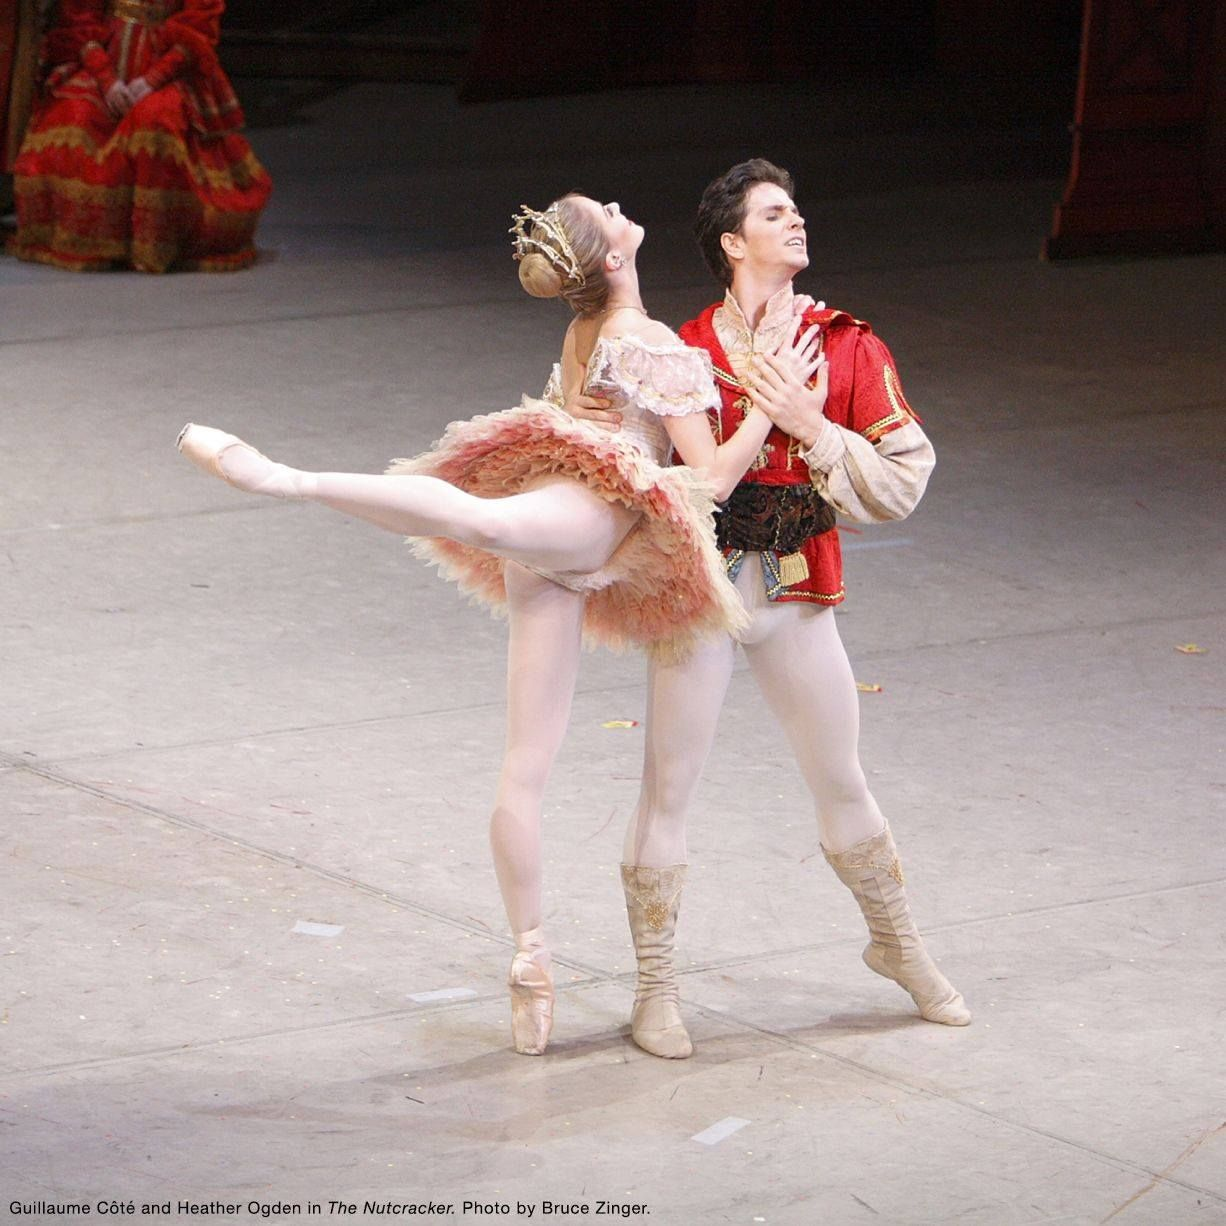 Pin by Karen Goument on Ballet Ballet pictures, Dance